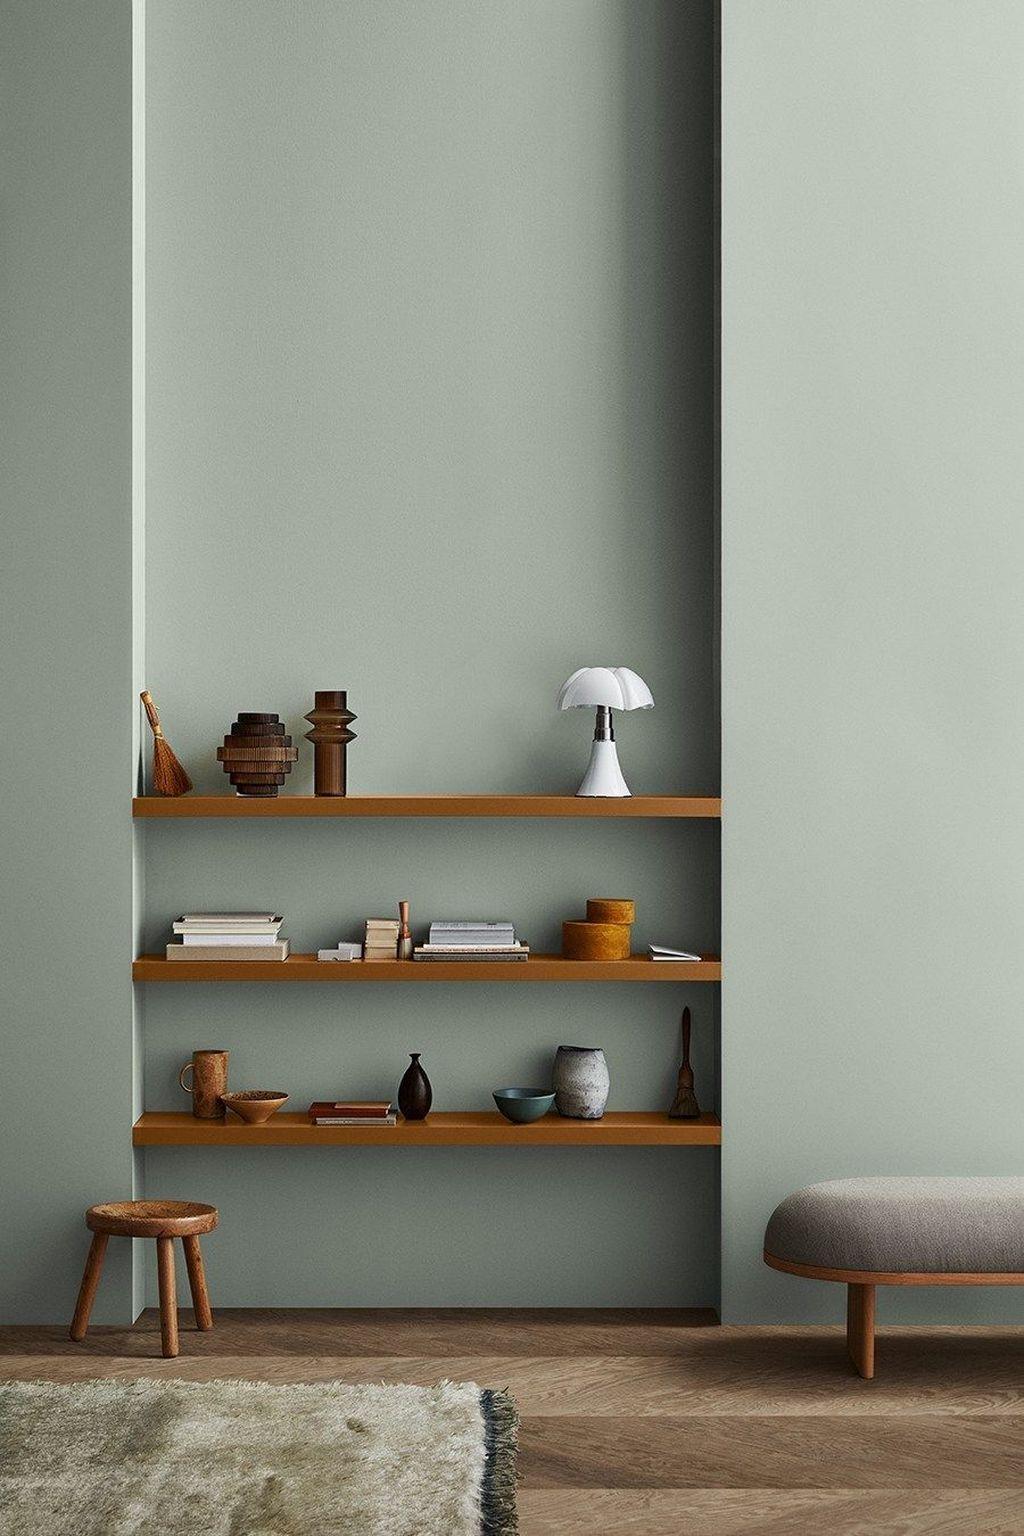 40 Awesome Home Interiors Design Ideas To Make Your Beautiful Living Room Room Interior Interior Design Living Room Interior